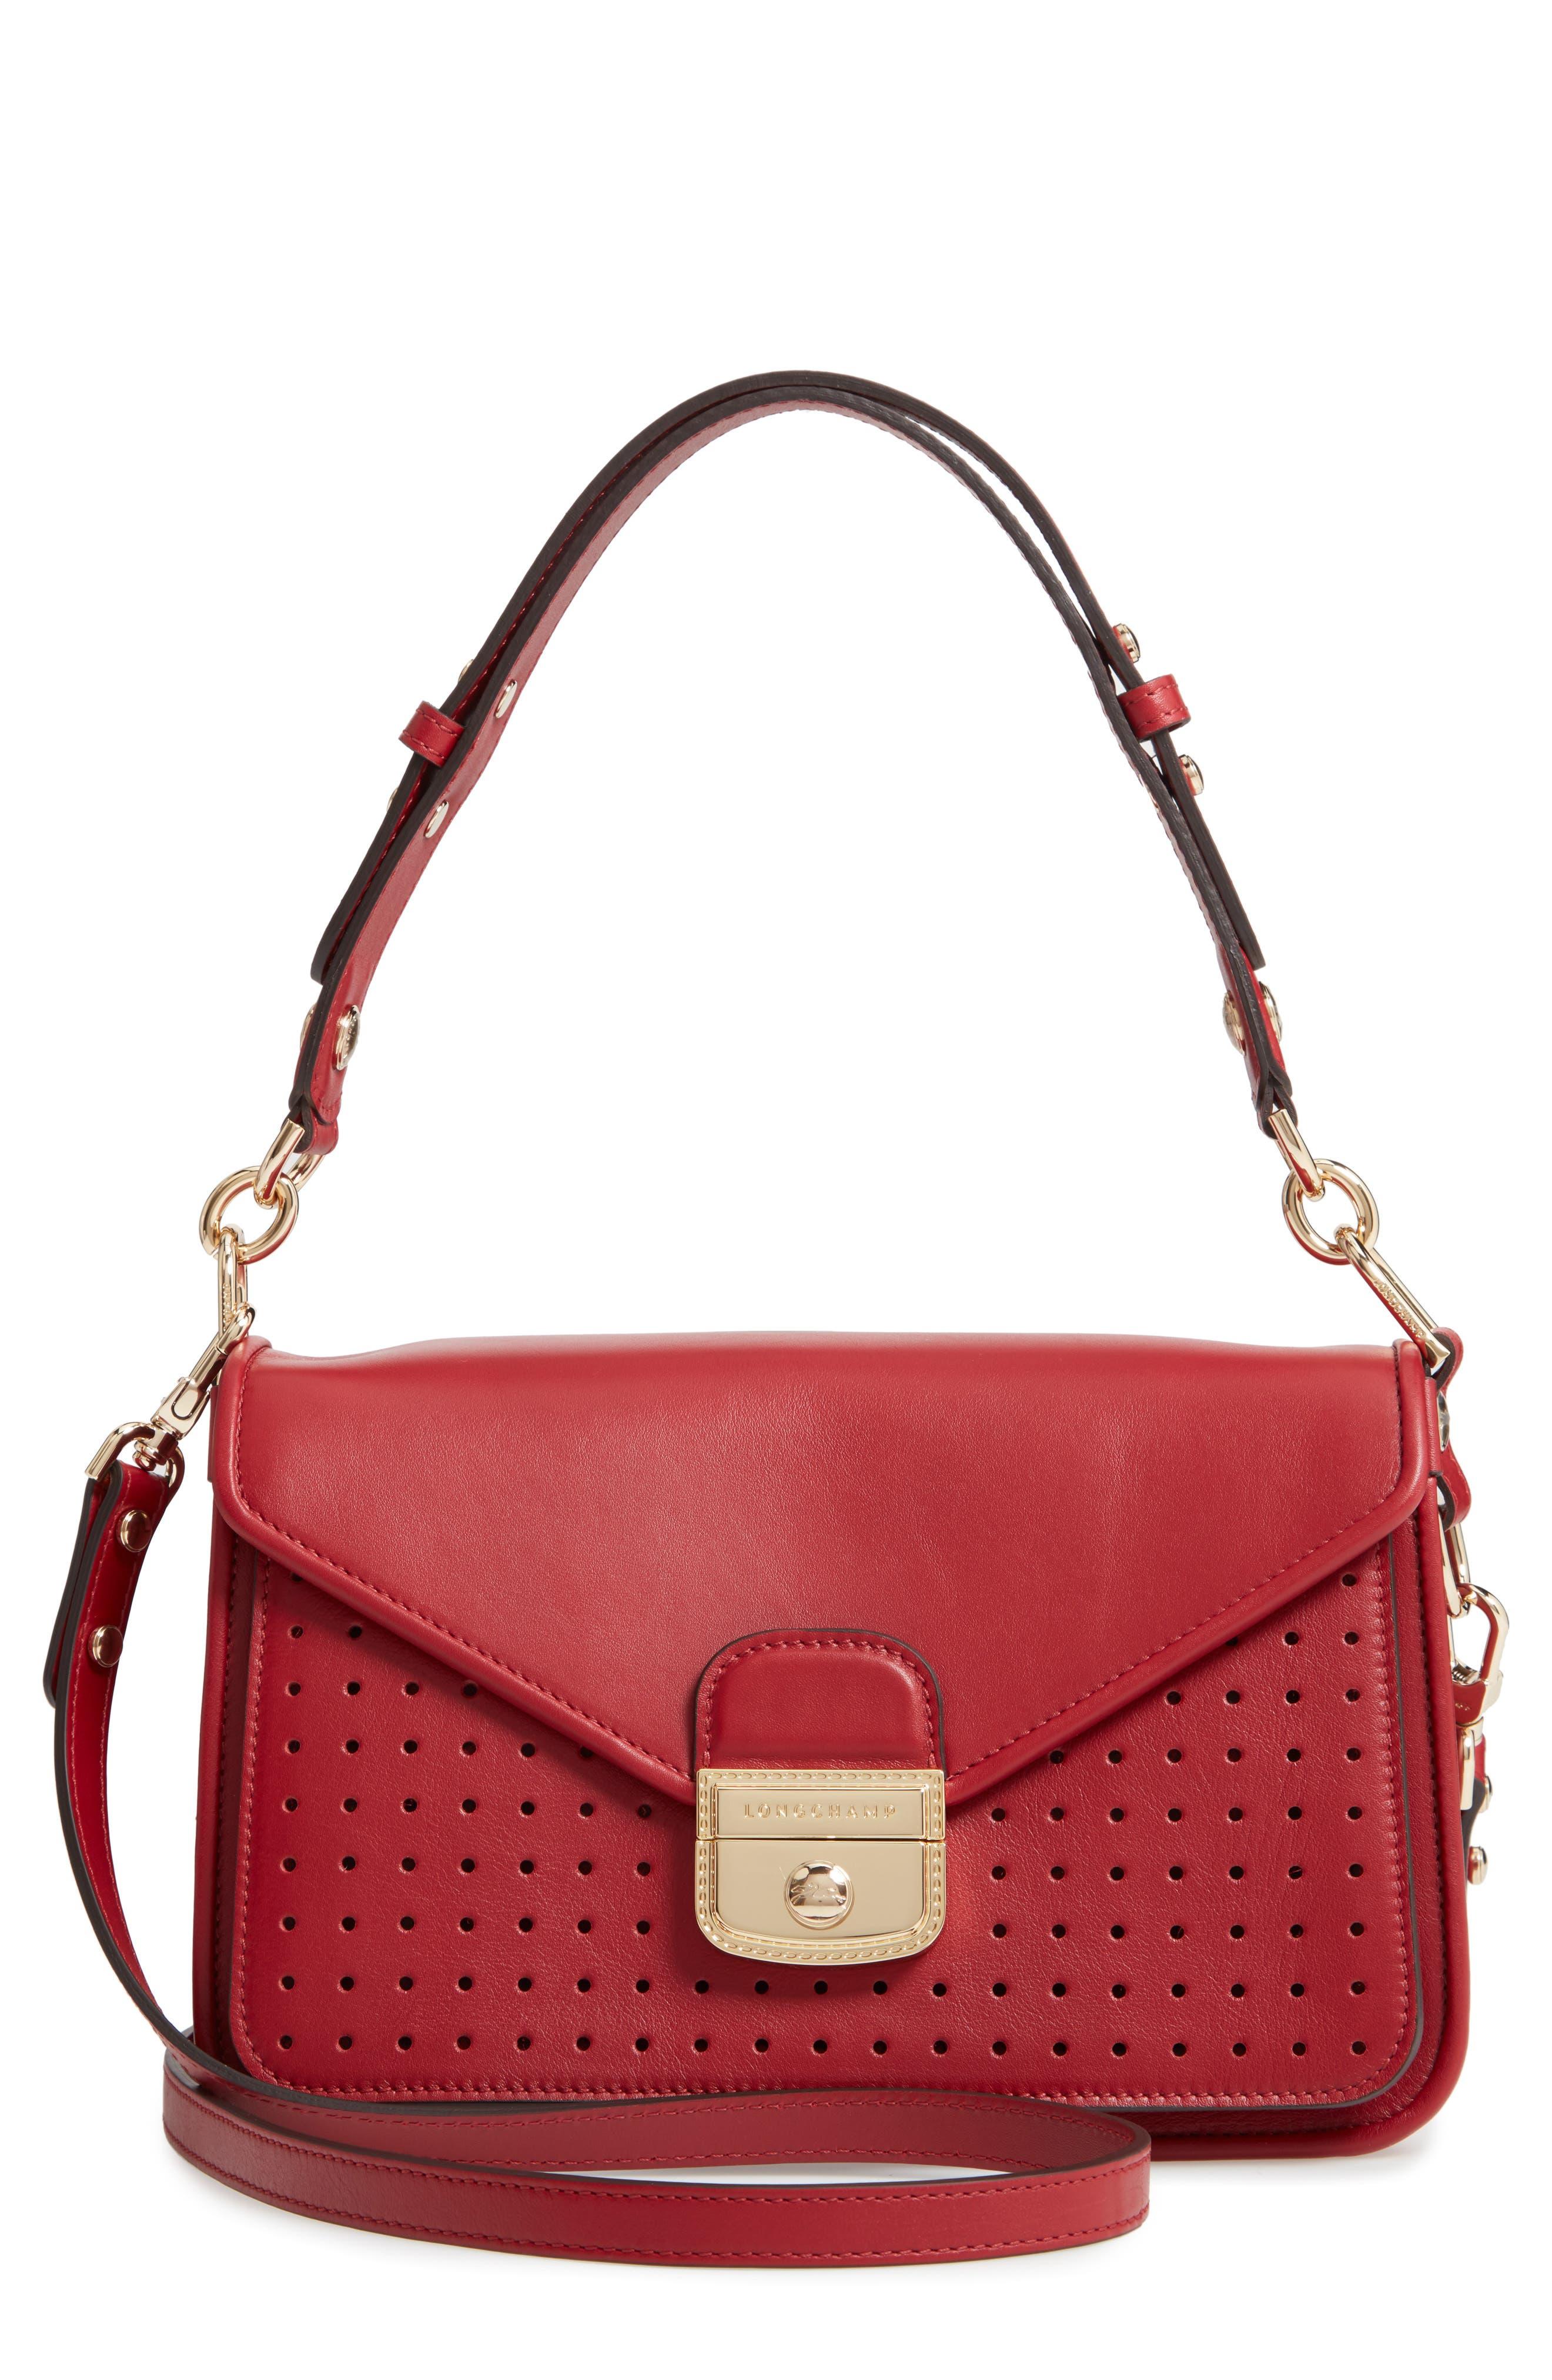 Mademoiselle Calfskin Leather Crossbody Bag,                             Main thumbnail 1, color,                             GARNET RED